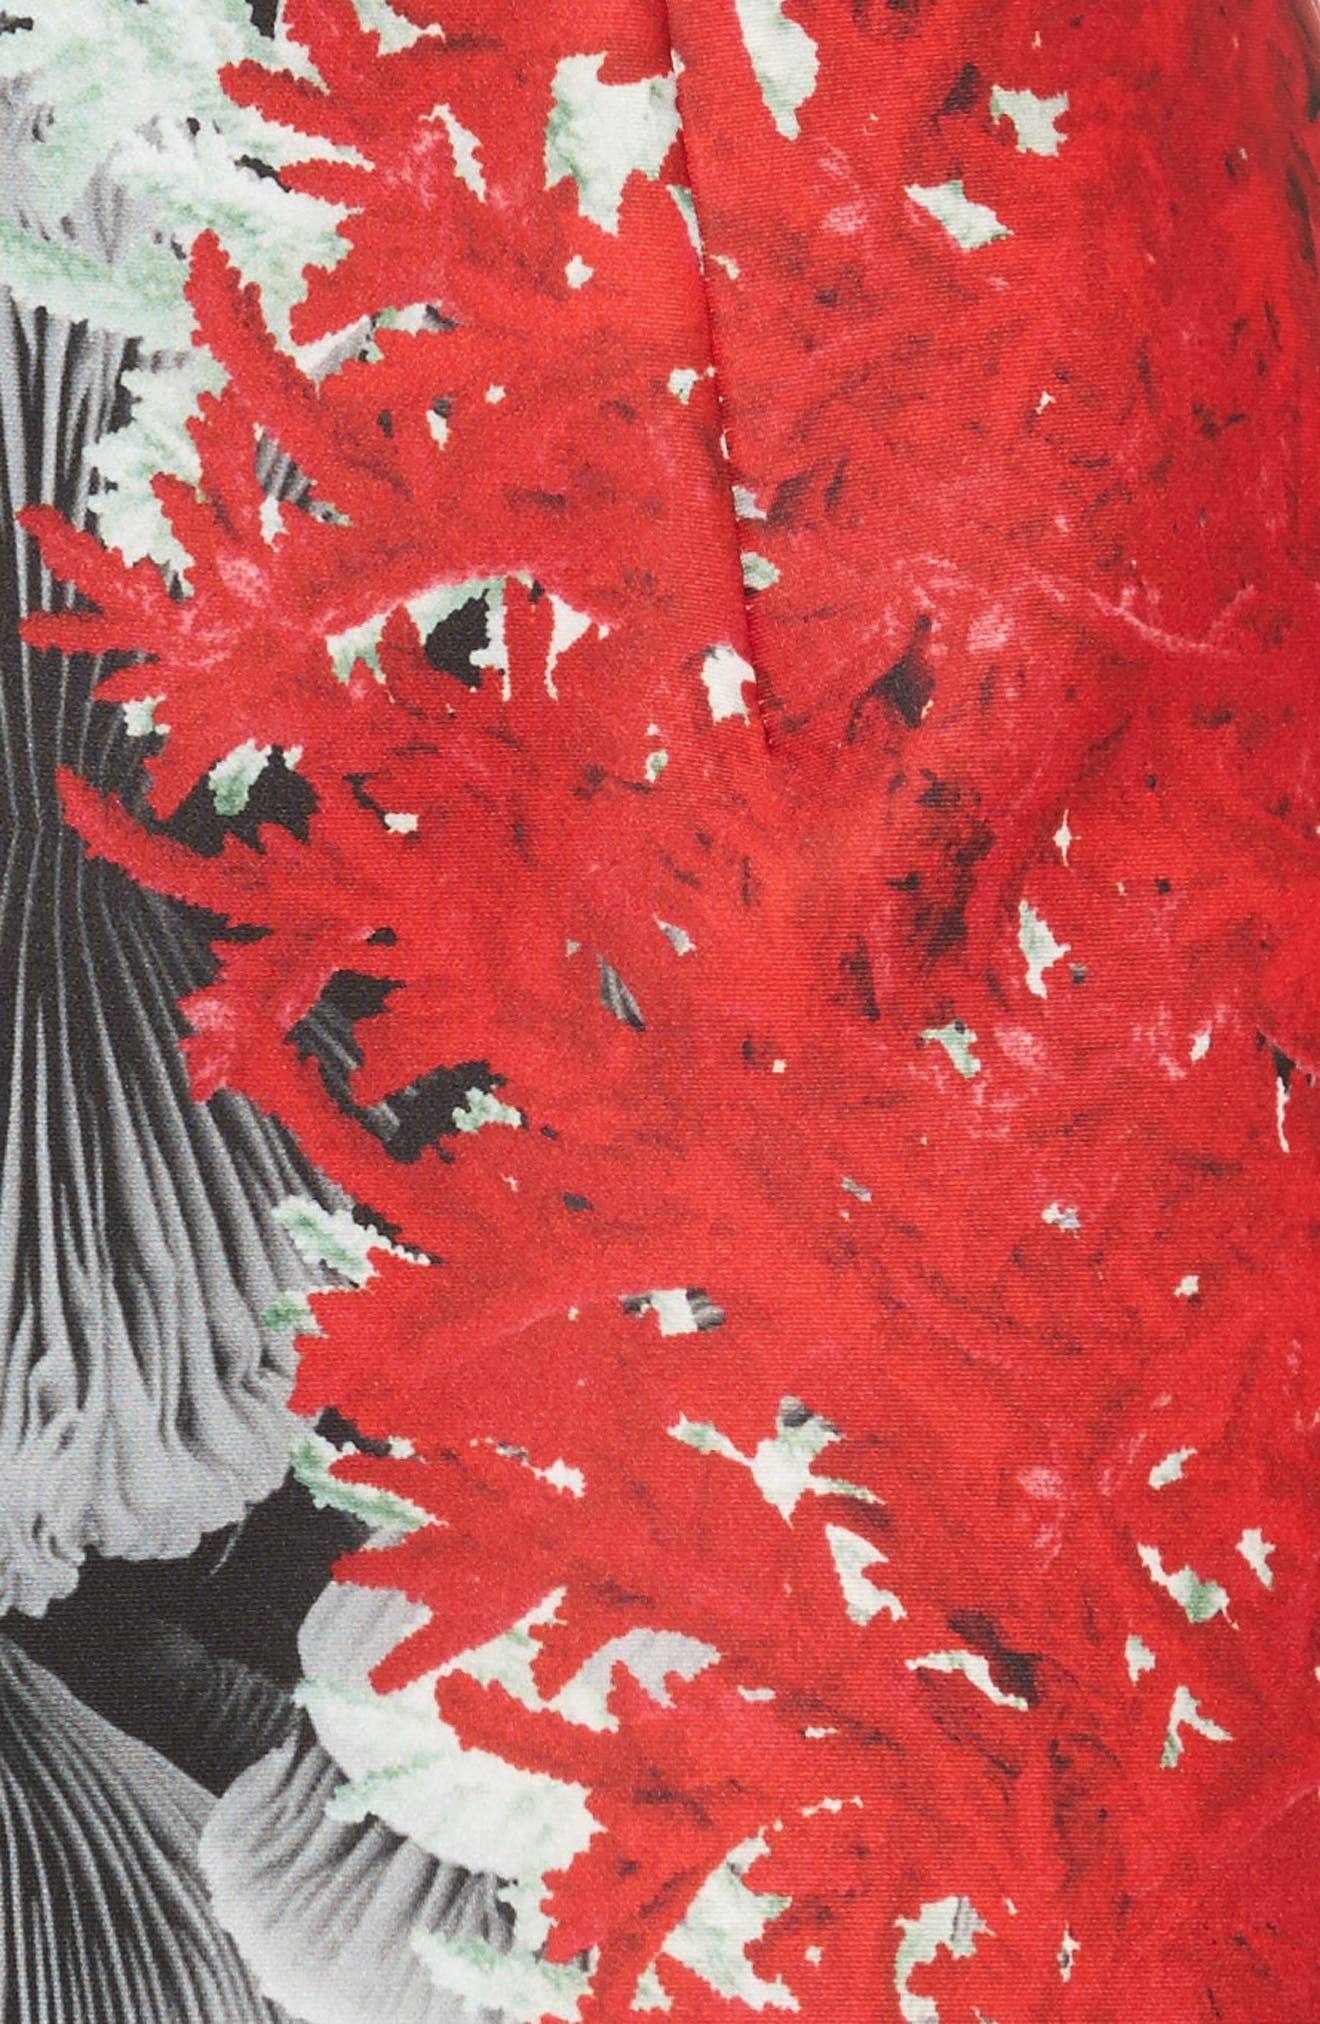 Coral Print Scuba Sheath Dress,                             Alternate thumbnail 5, color,